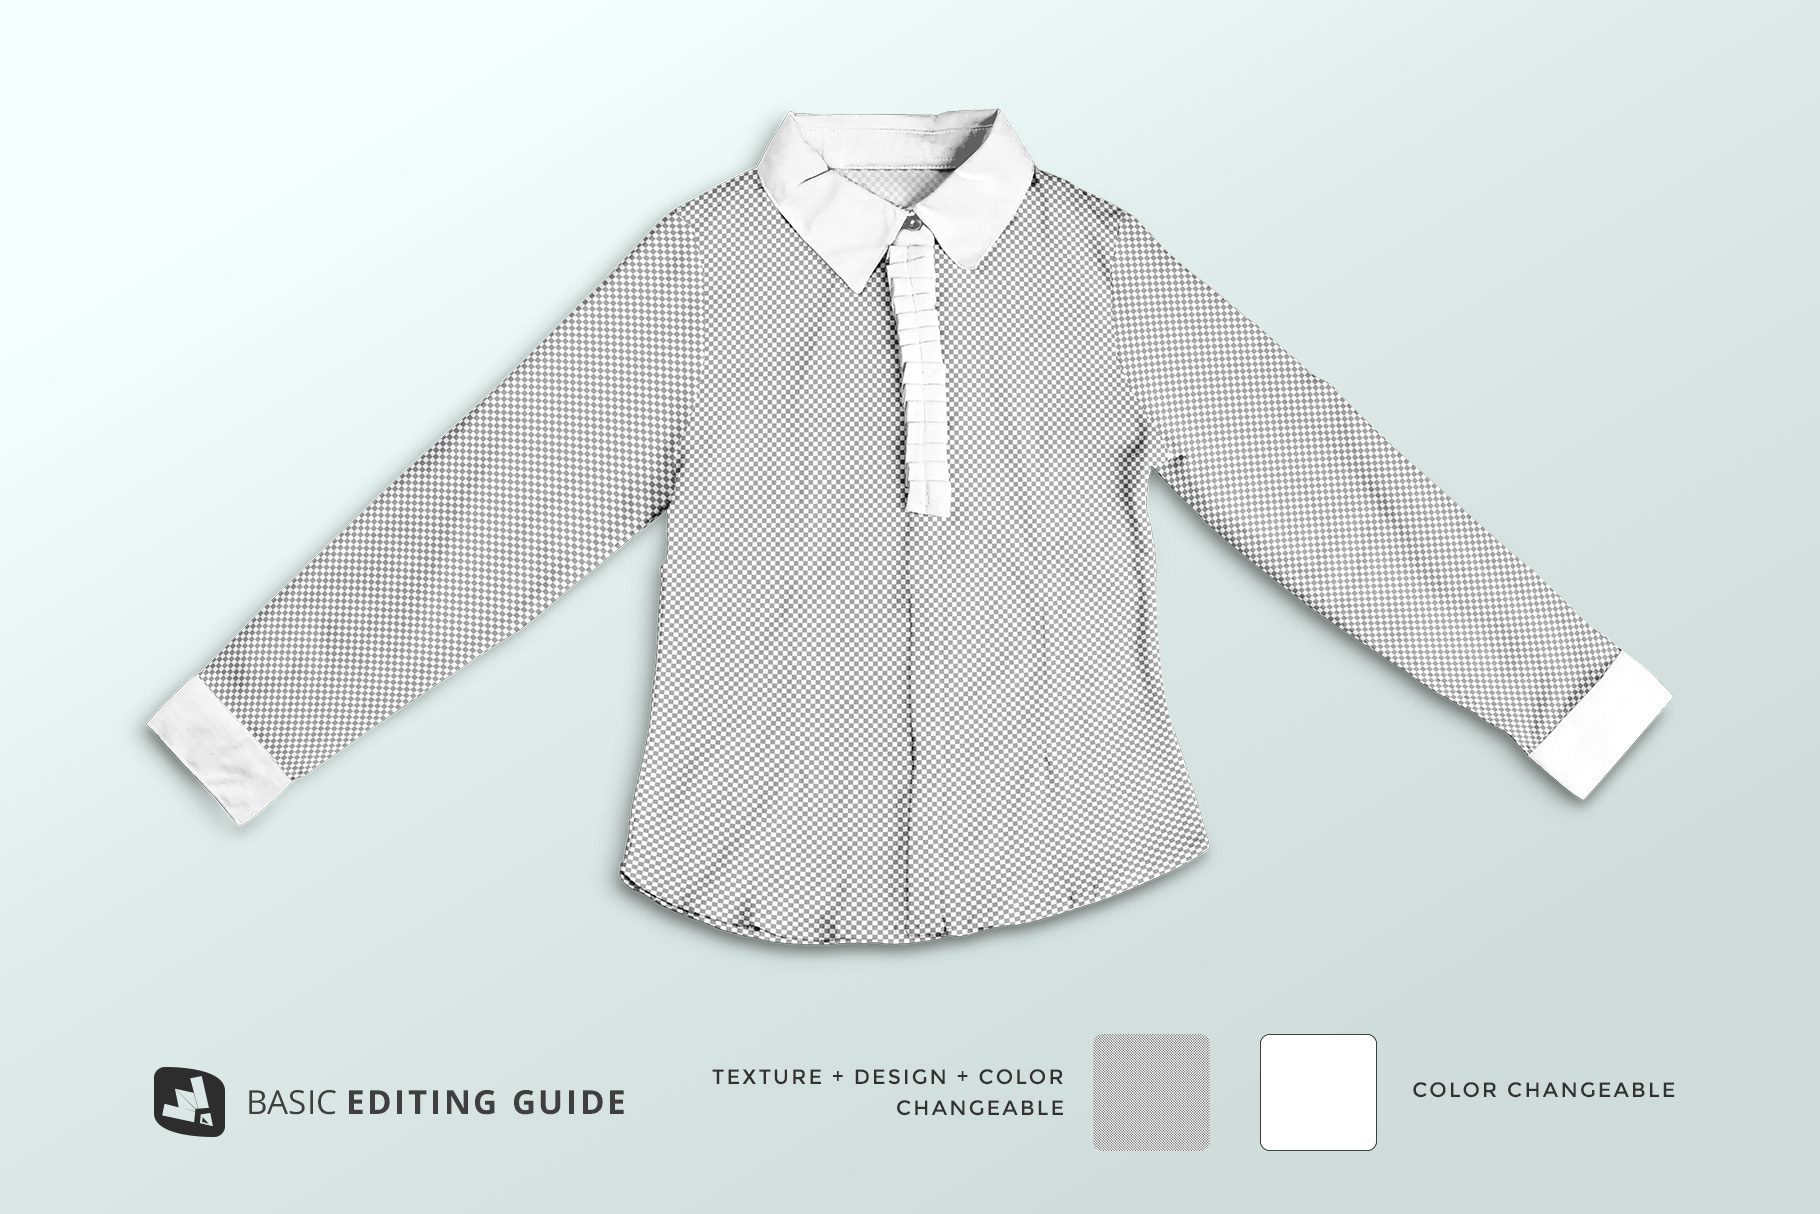 editability of the women's full sleeve blouse mockup